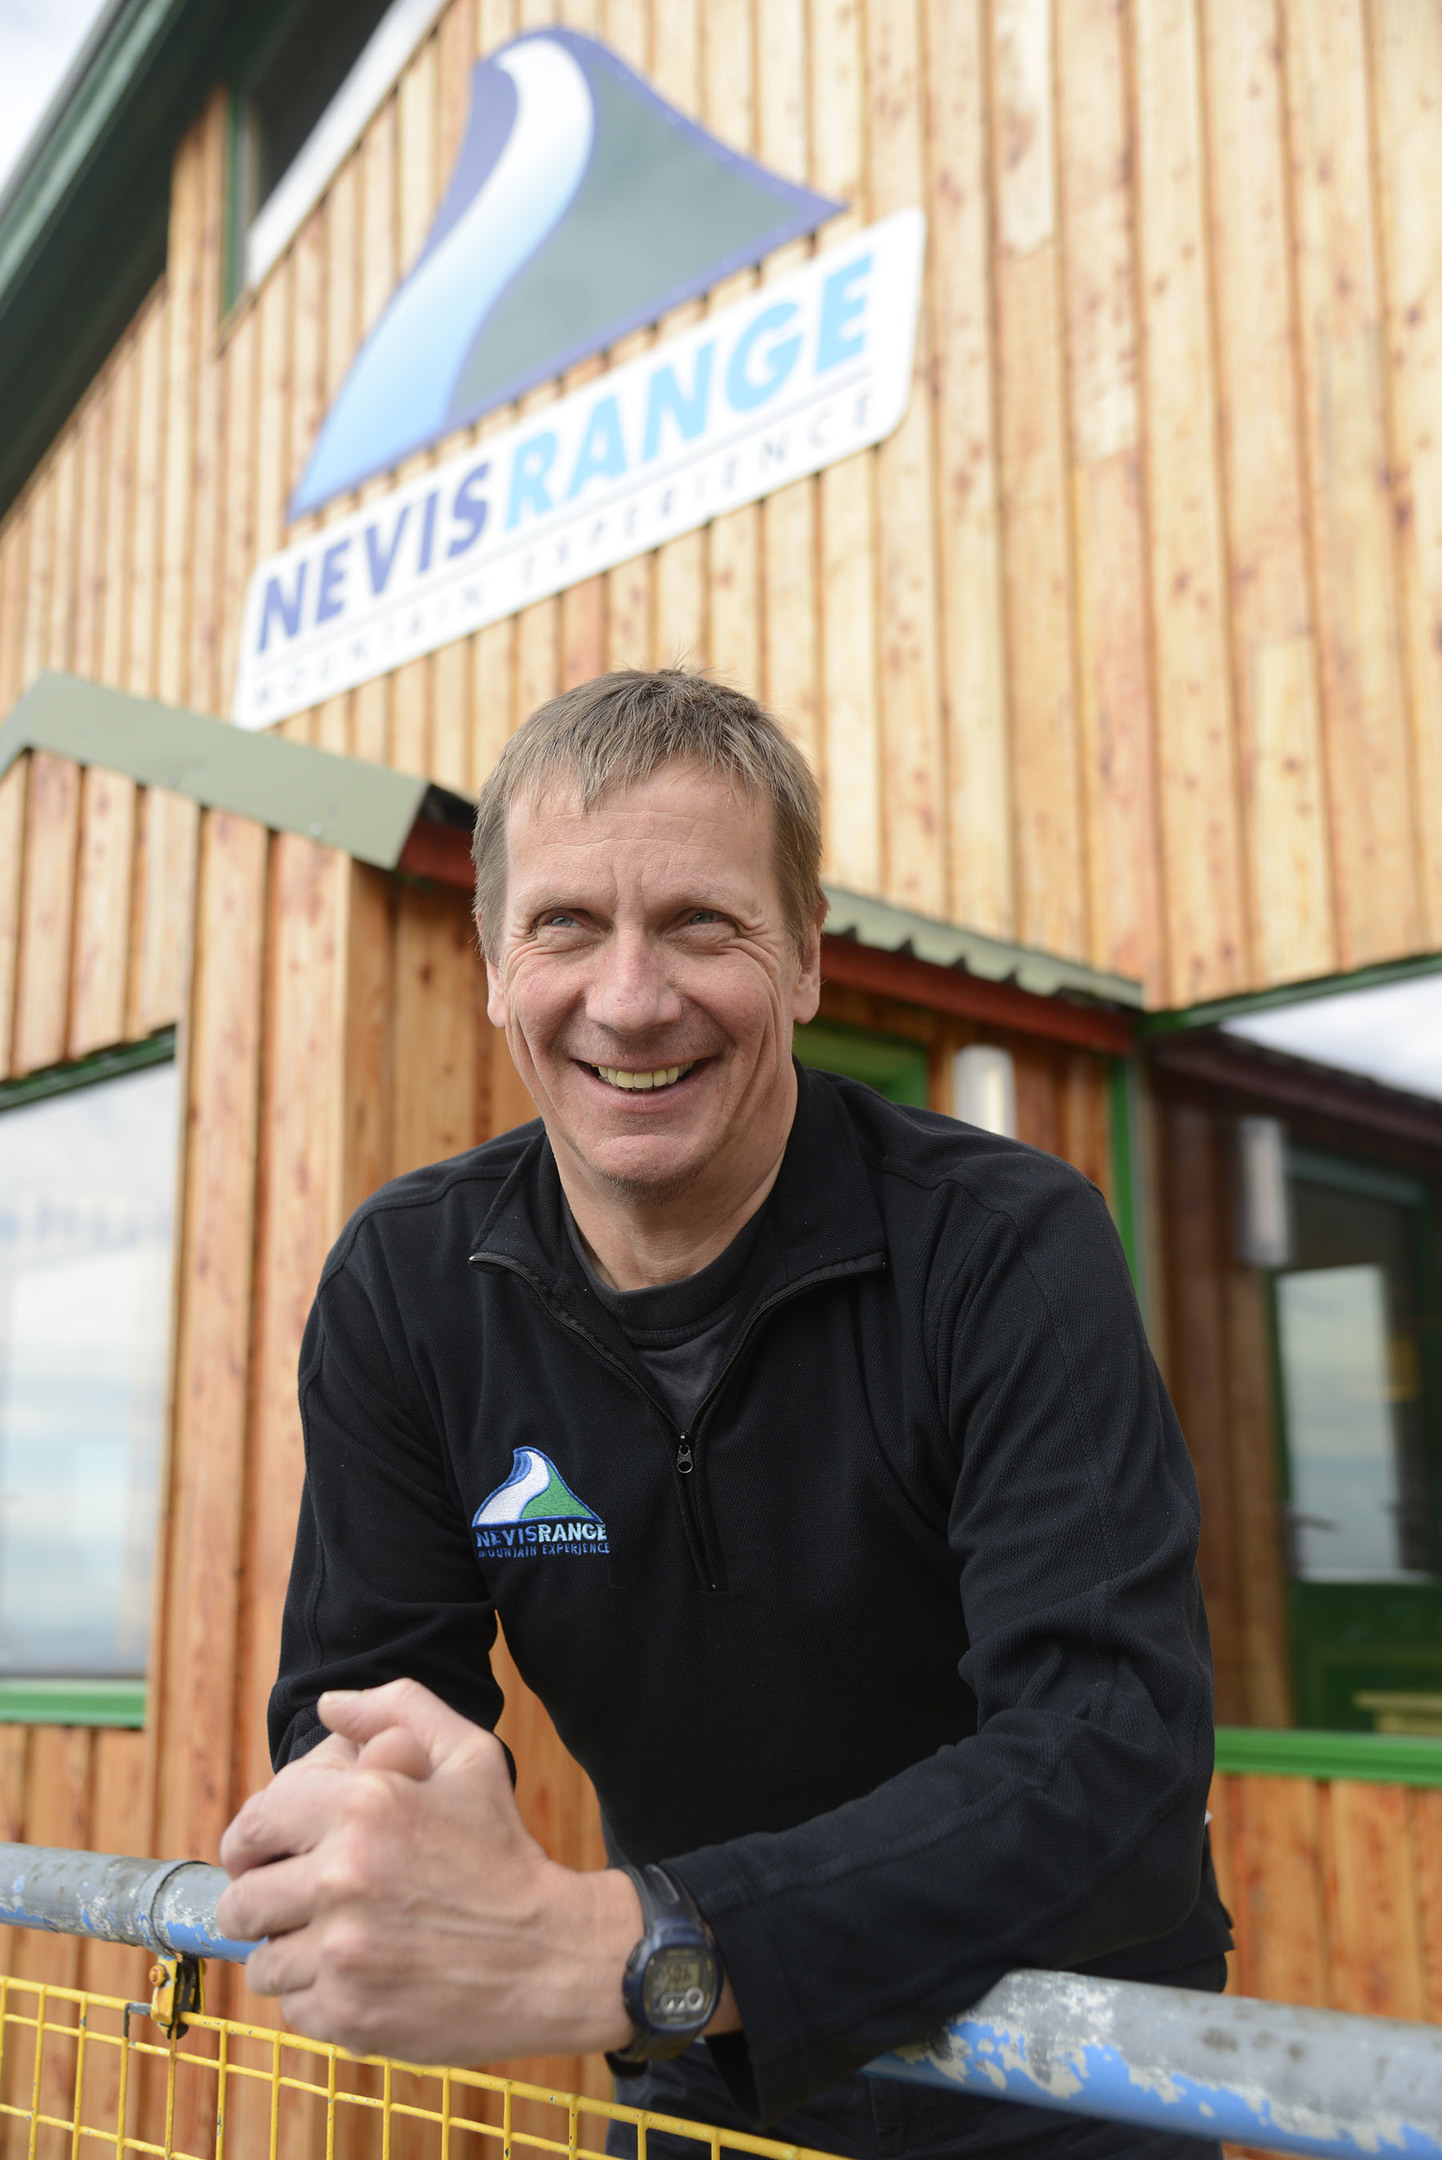 Peter MacFarlane, New MD of Nevis Range